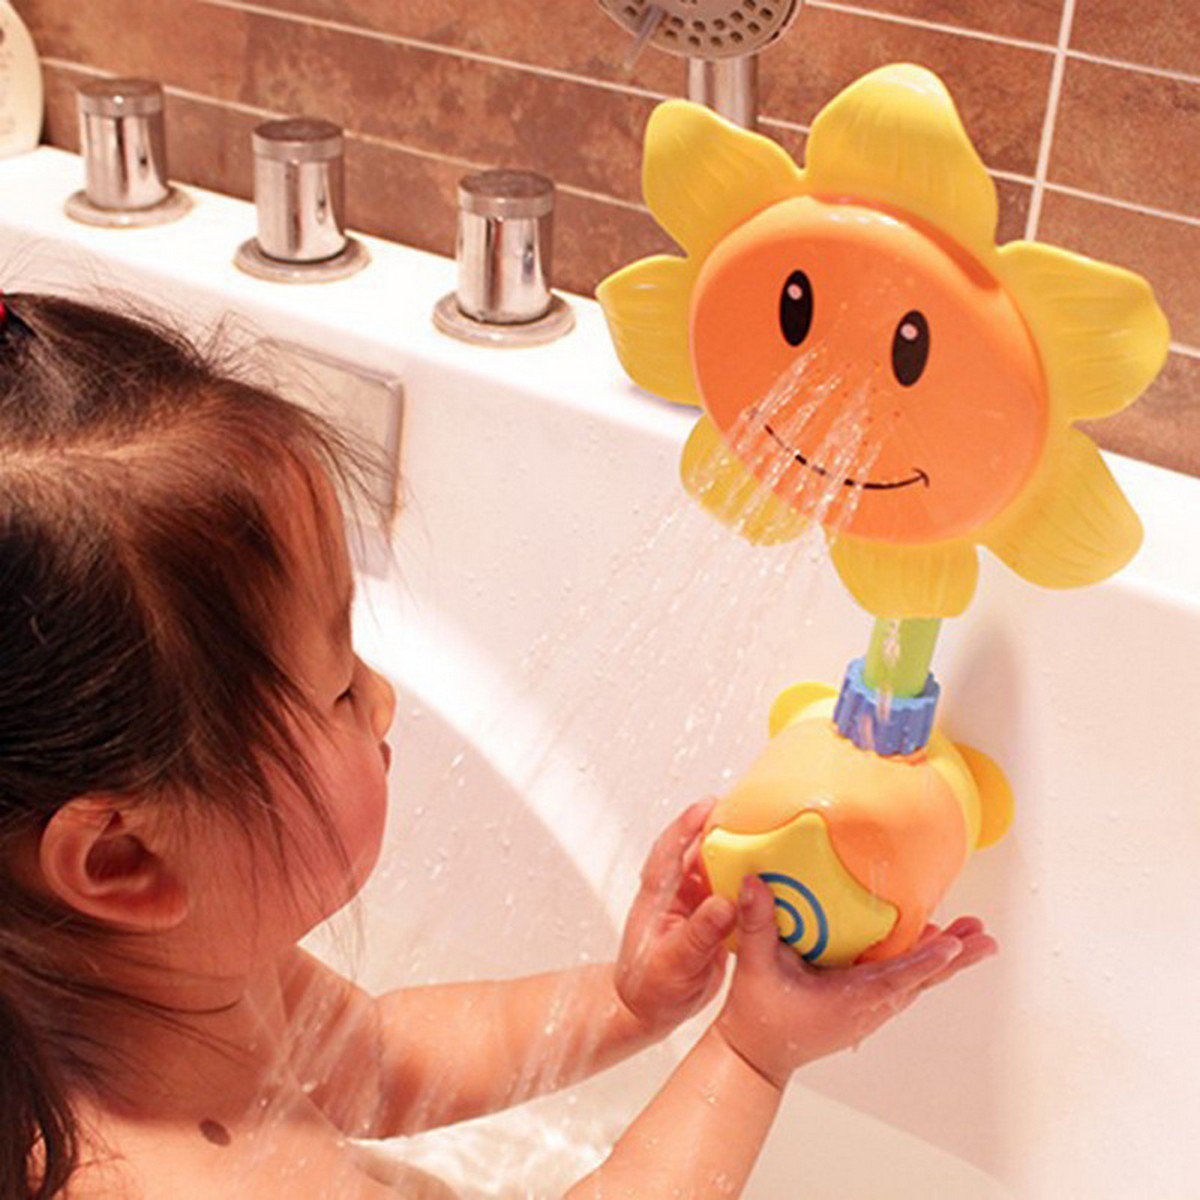 Buy Baby Bath Toys Dabbling Sunflower Shower Faucet  Children Bath Parent child Interaction Learnin